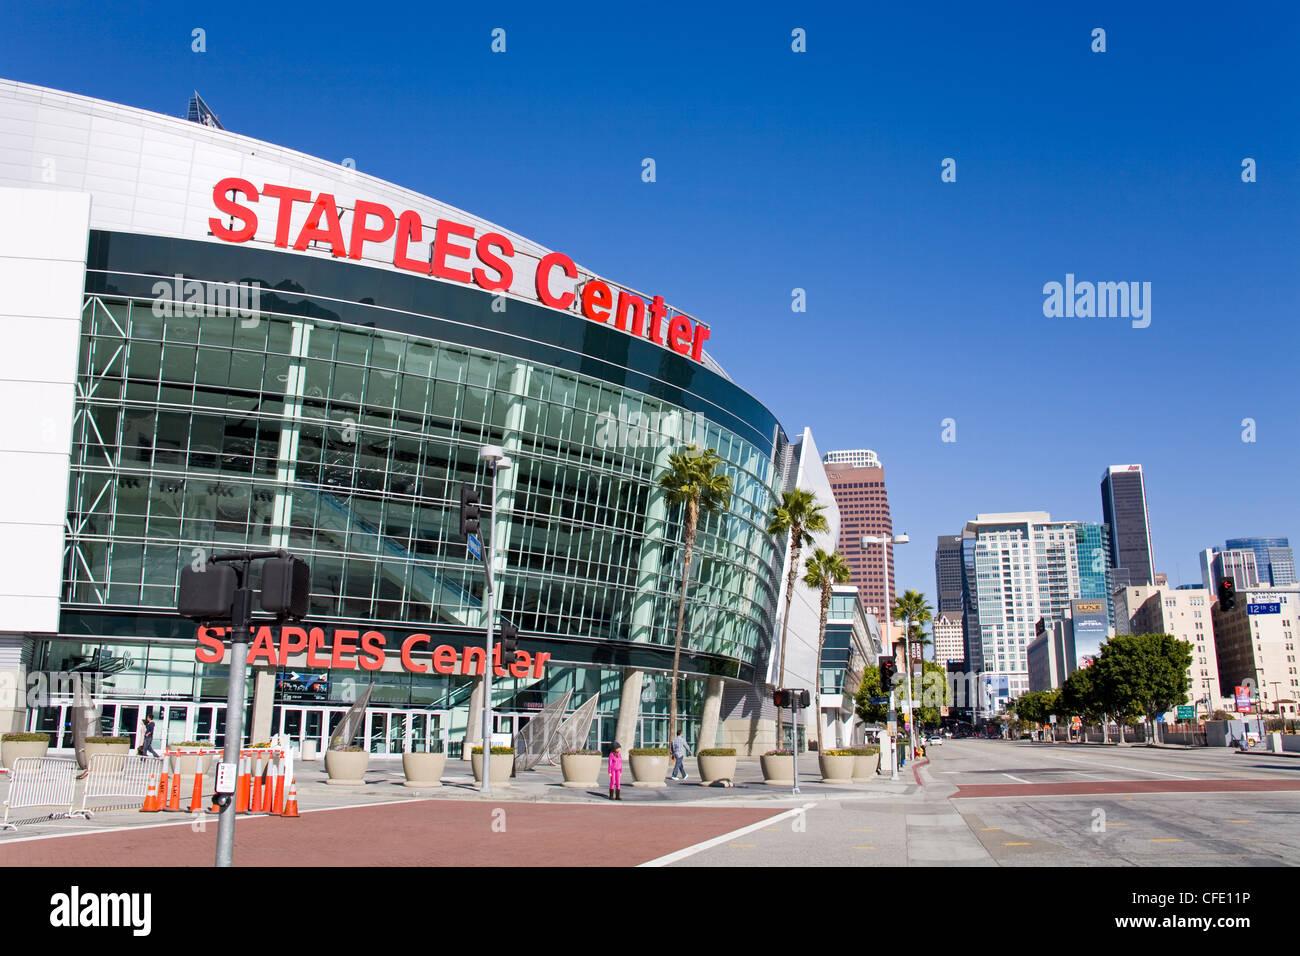 Staples Center, Los Angeles, California, United States of America, - Stock Image